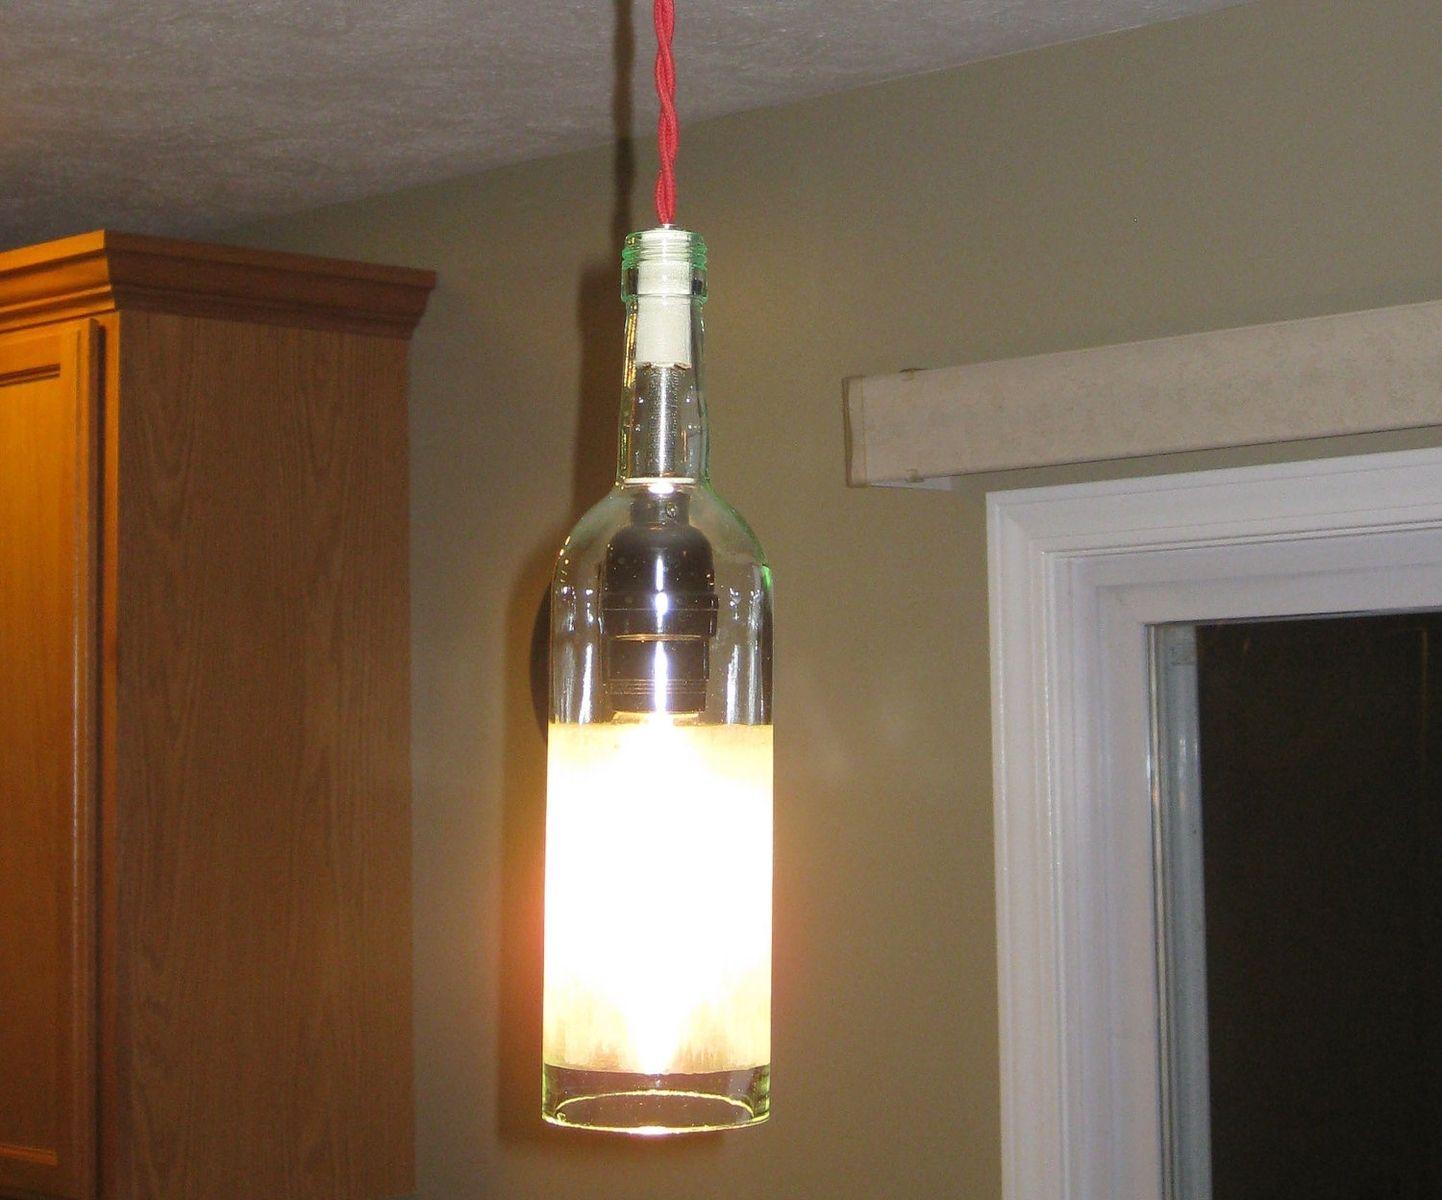 Custom made wine bottle pendant light by milton douglas lamp co custom made wine bottle pendant light by milton douglas lamp co custommade aloadofball Gallery